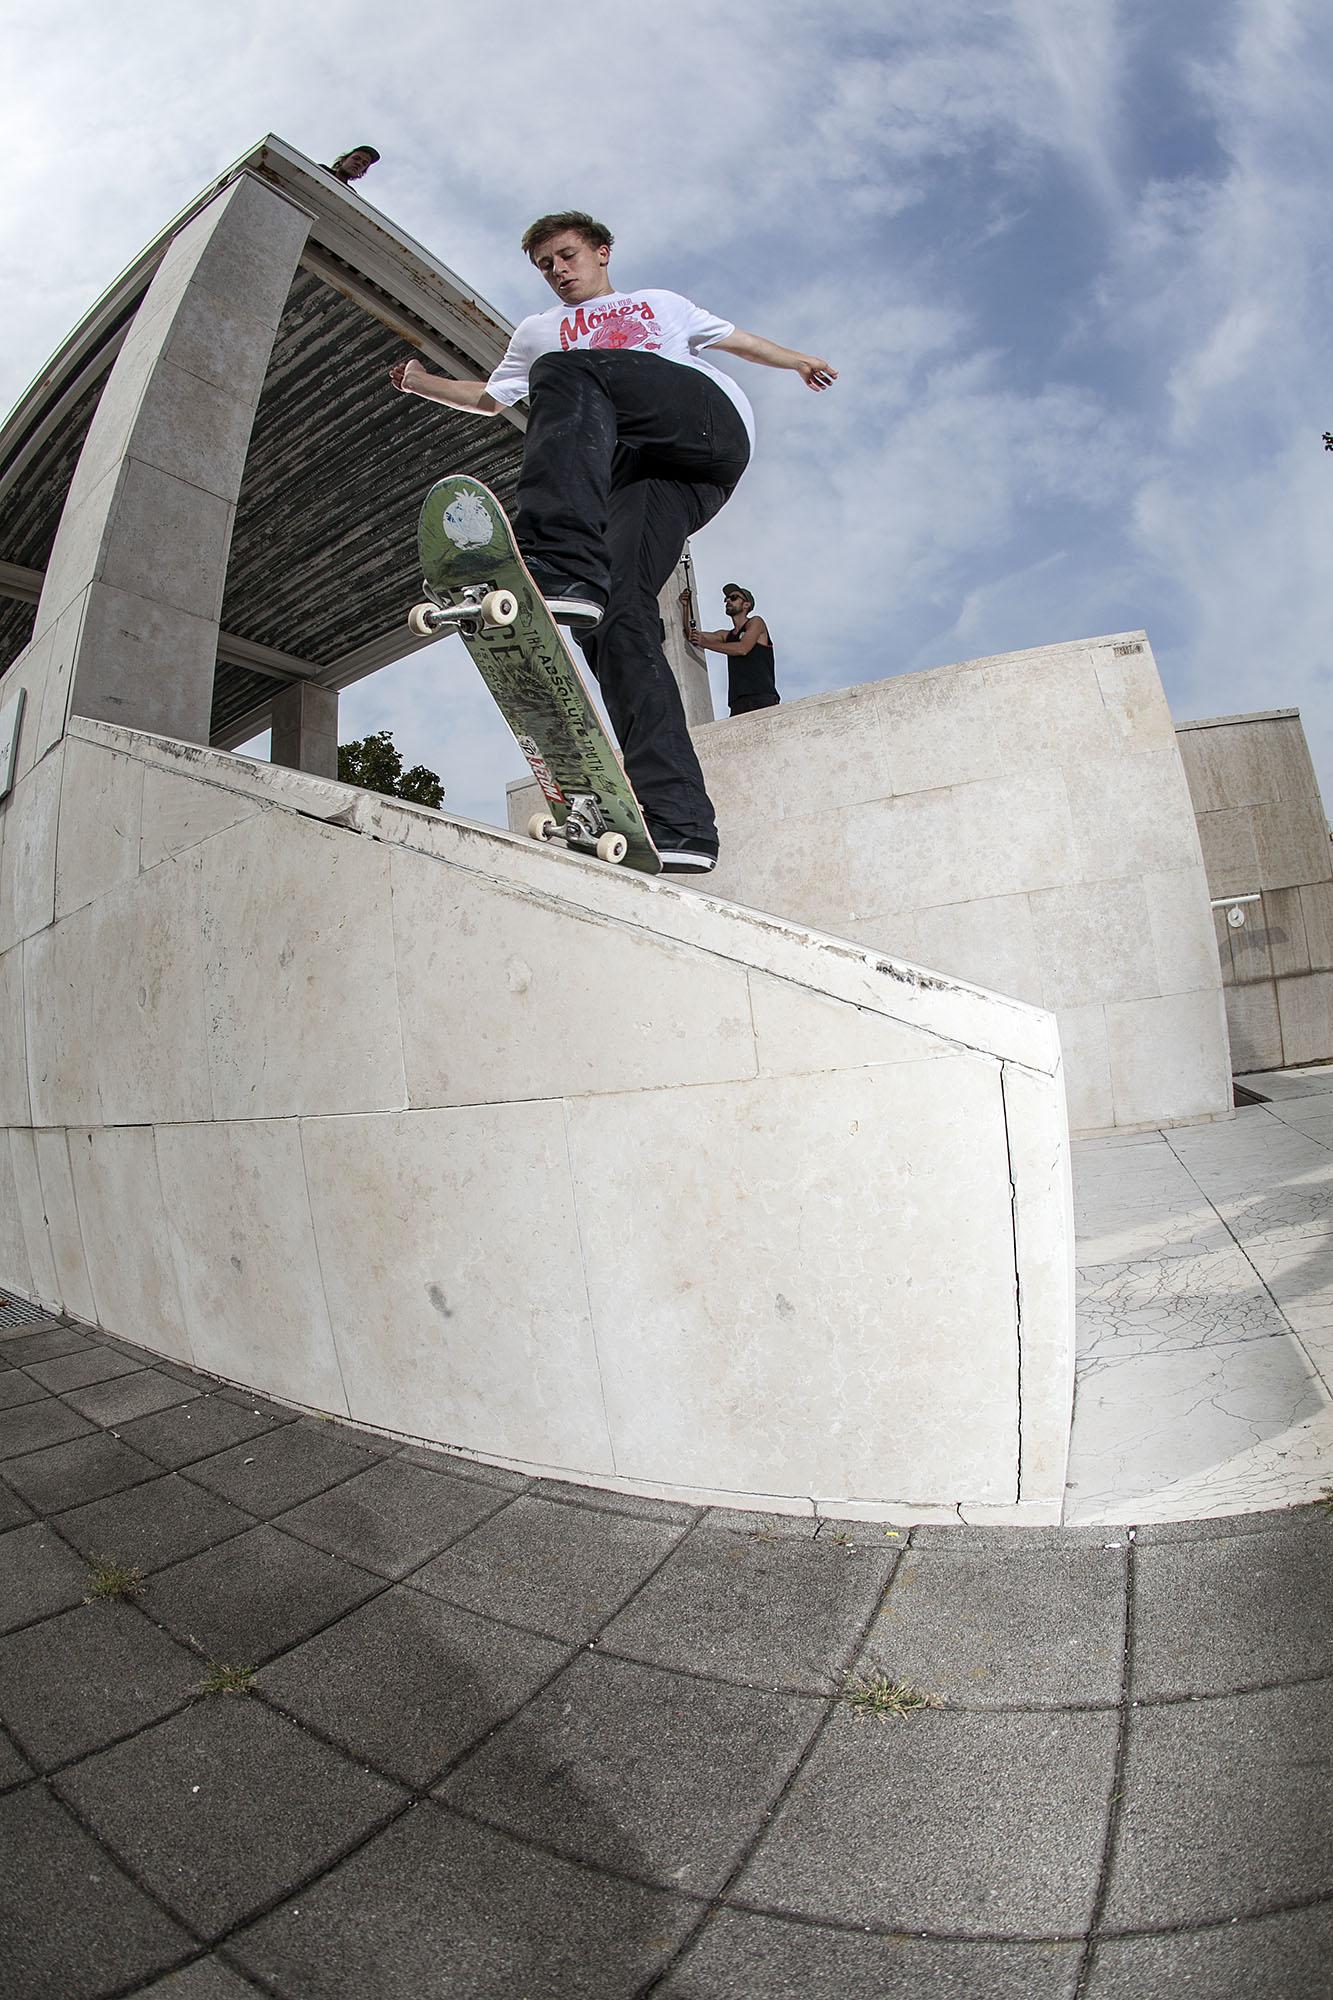 Tom Dietrich – Frontside Bluntslide | Mailand Uni | Foto: Martin Herrmann